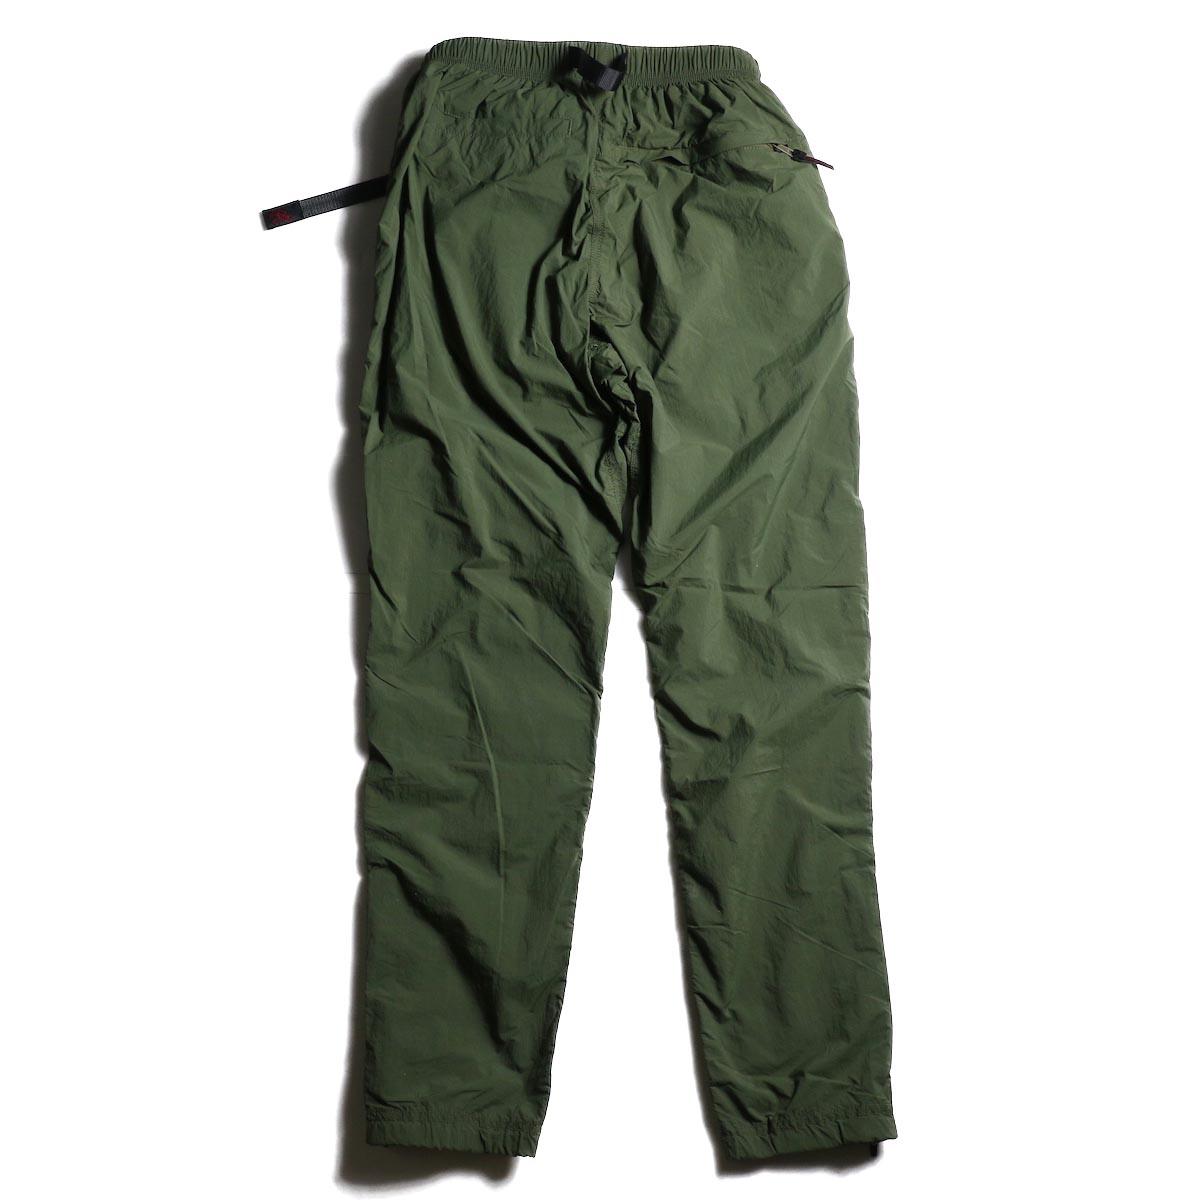 GRAMICCI / Packable Truck Pants (Olive)  背面